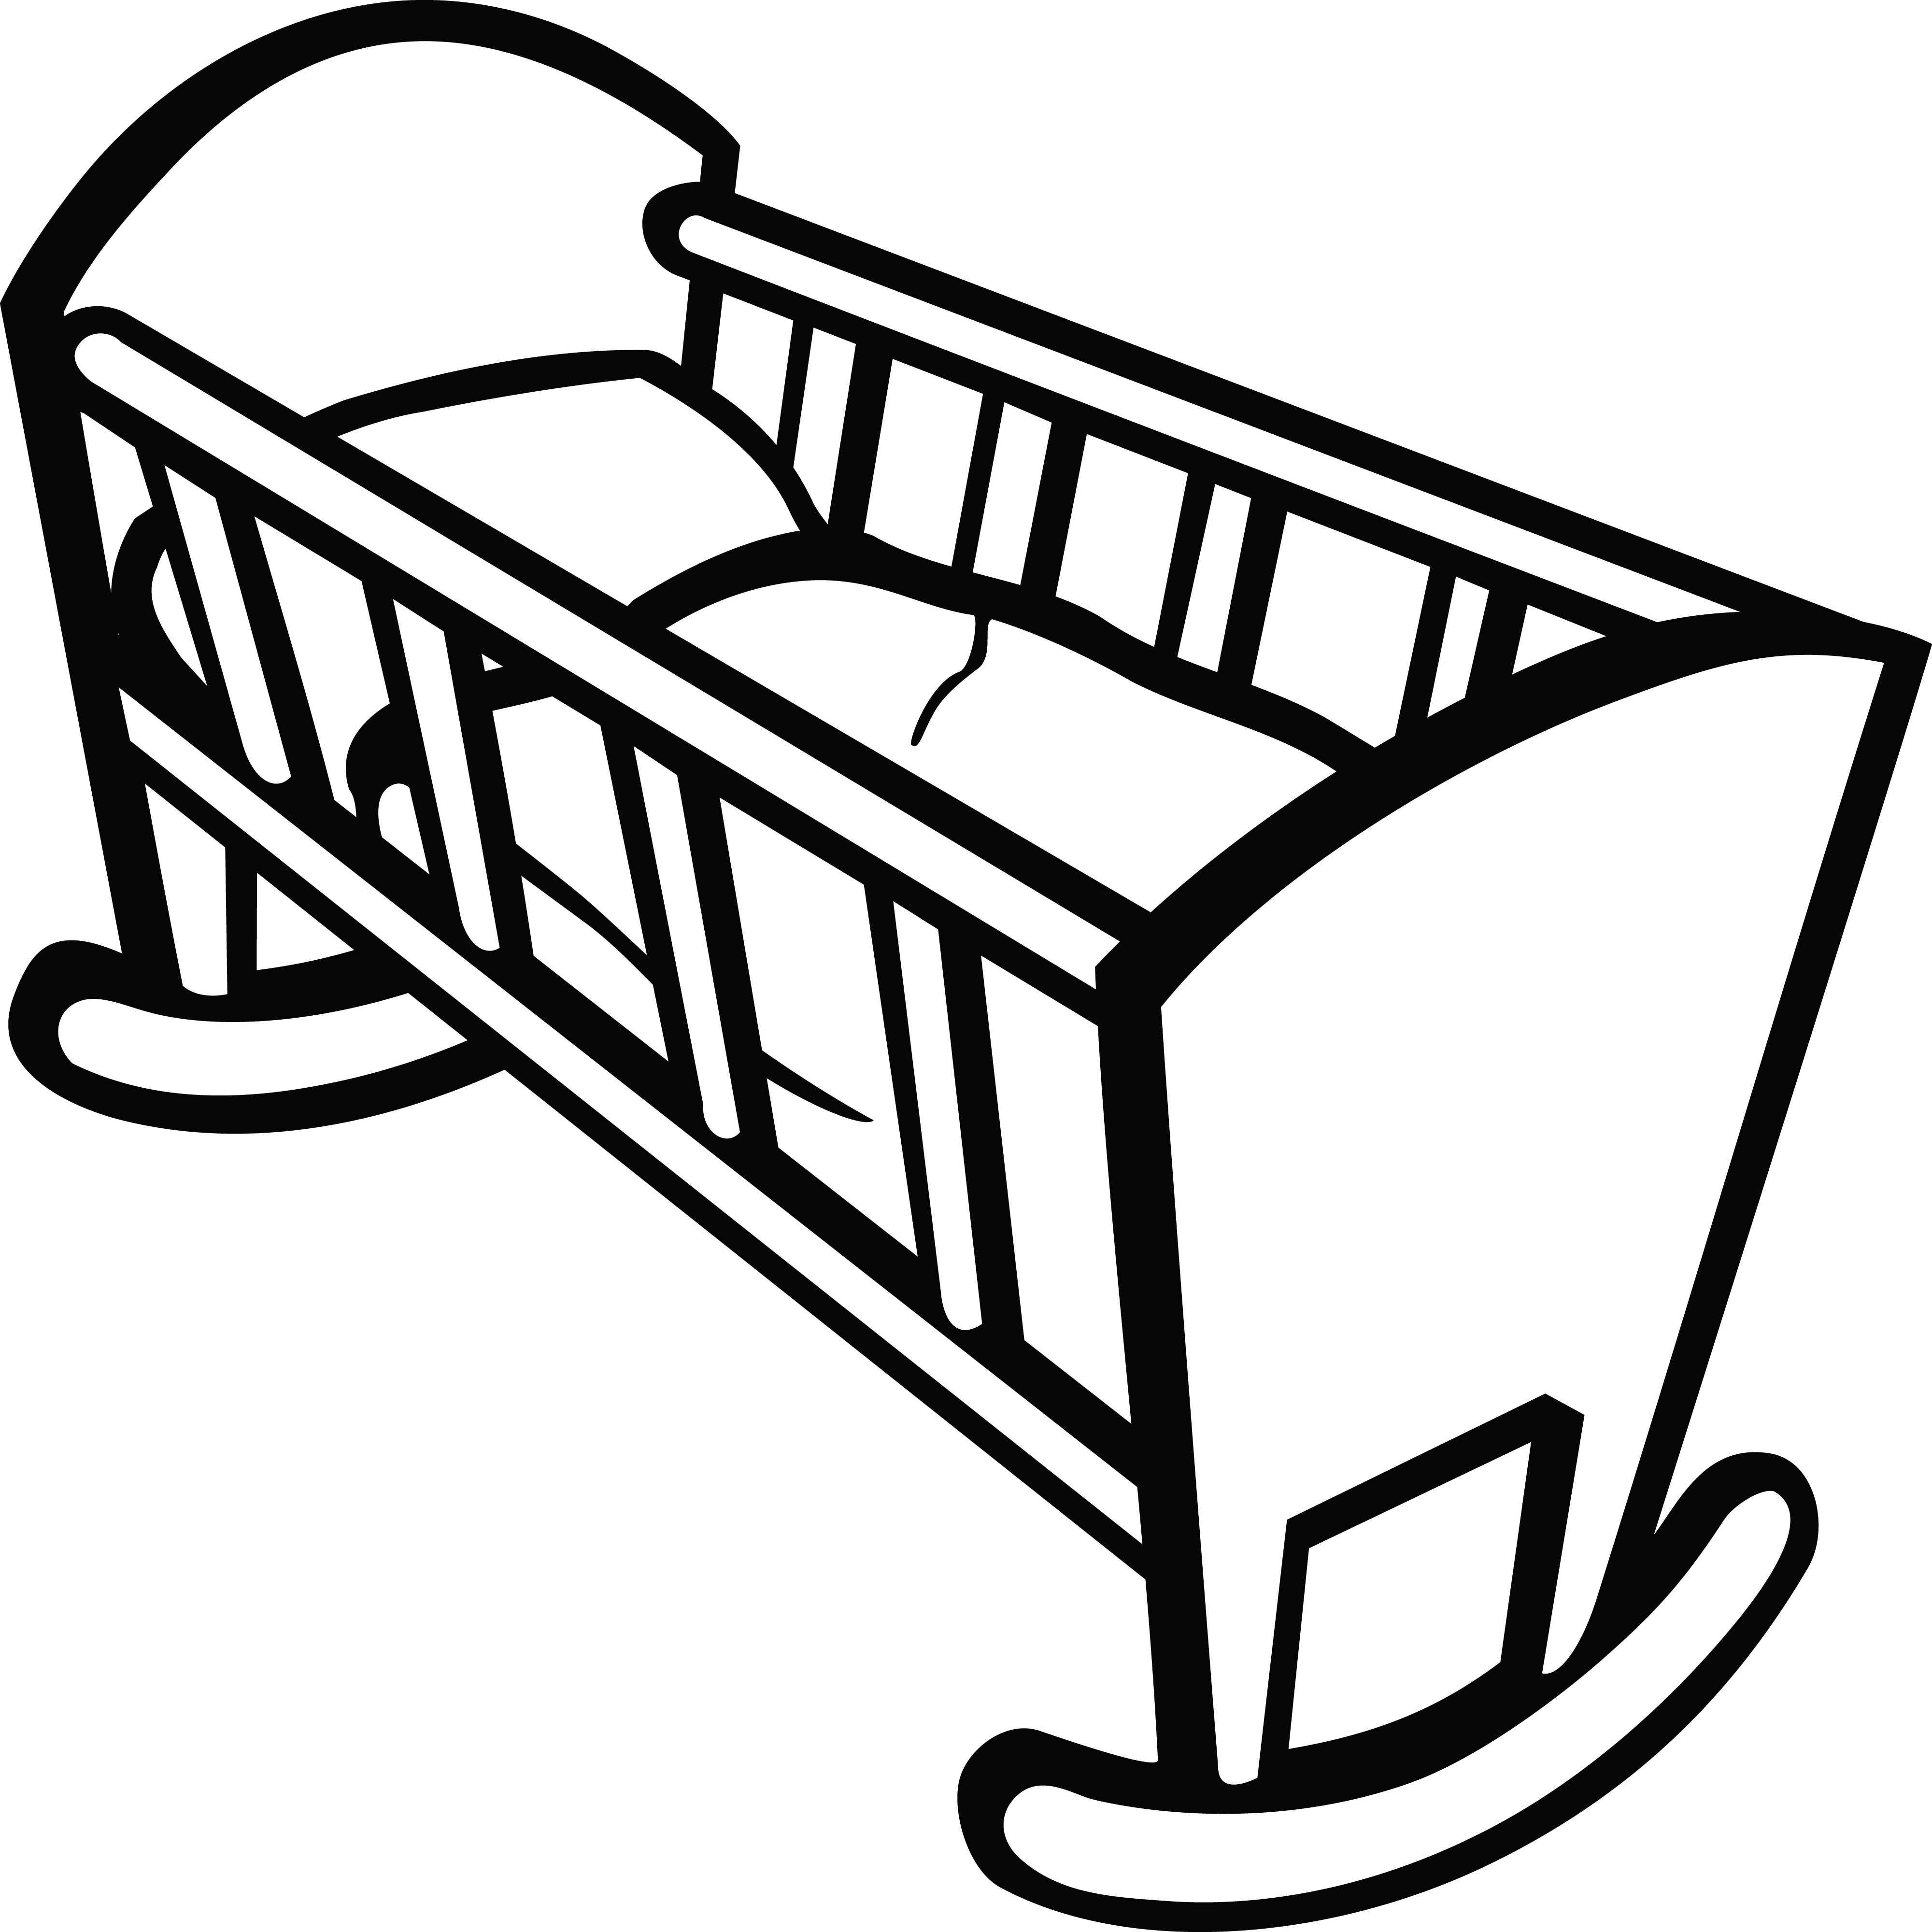 clipart of a baby crib crib pinterest crib filing and free rh pinterest com baby jesus in crib clipart baby crib clipart free